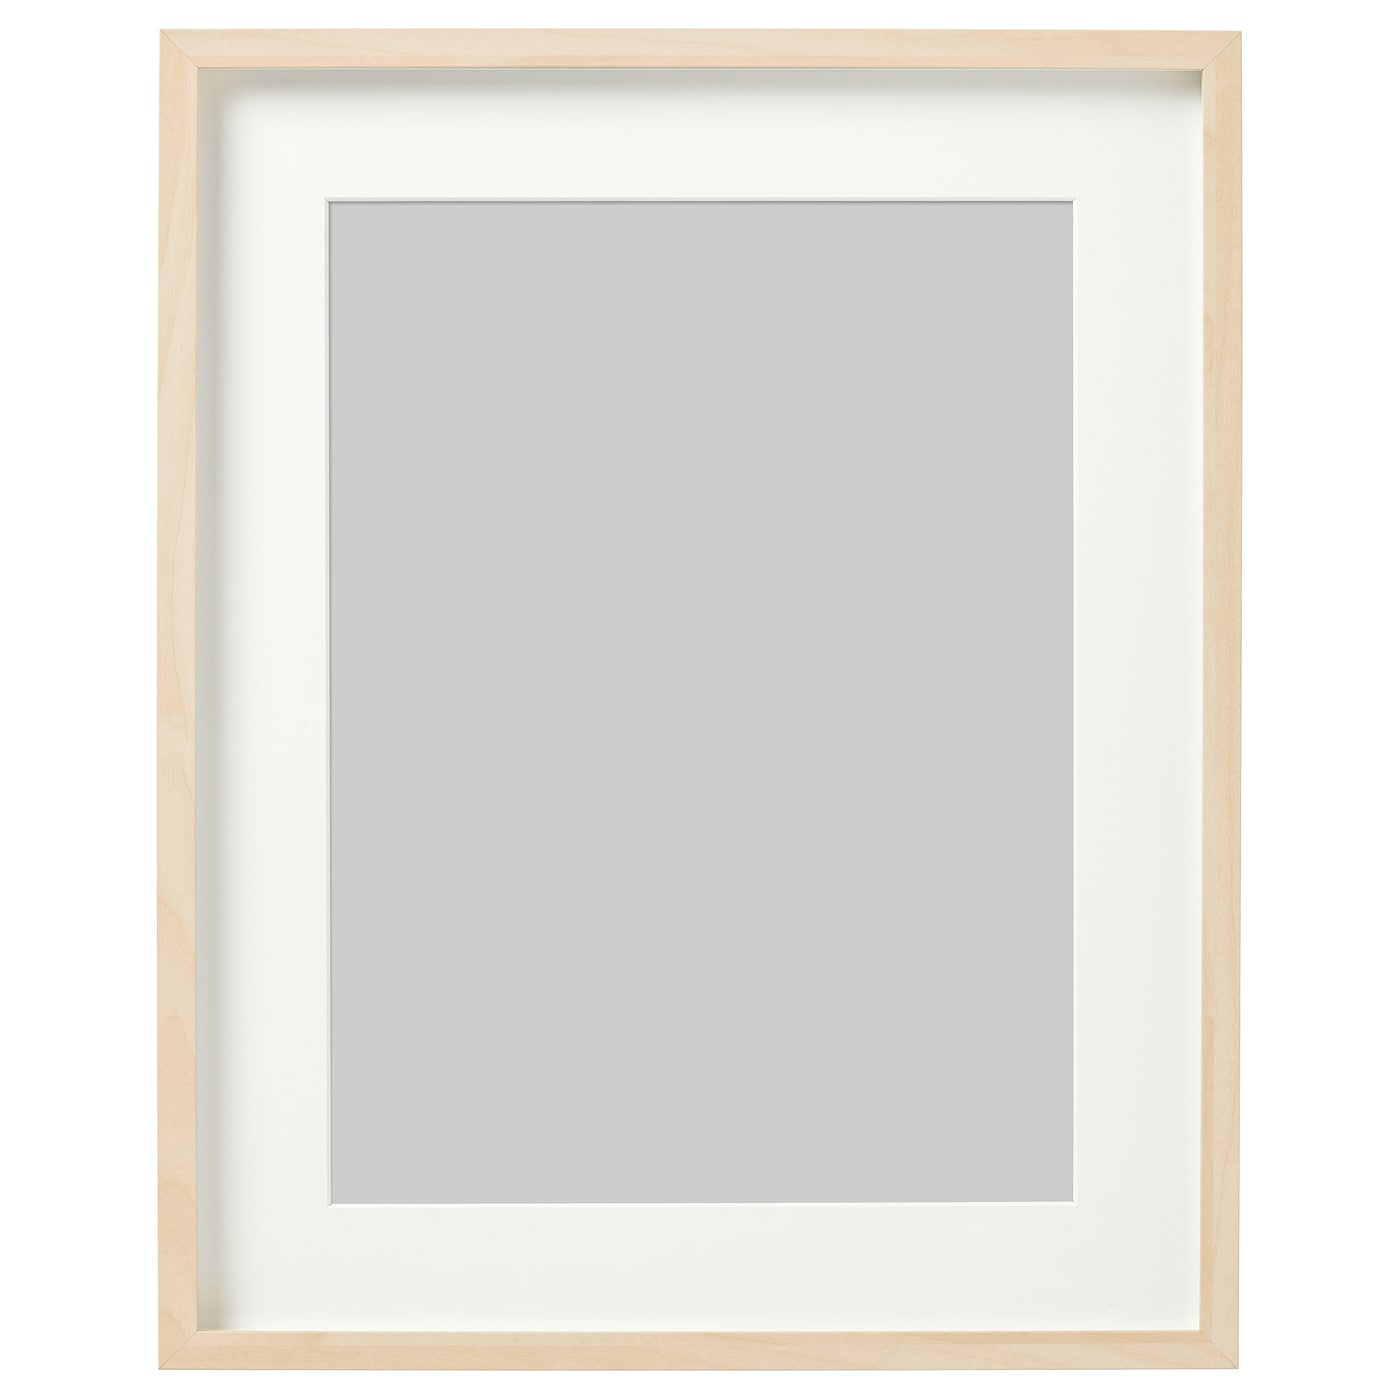 Hovsta Frame Birch Effect 40x50 Cm Ikea